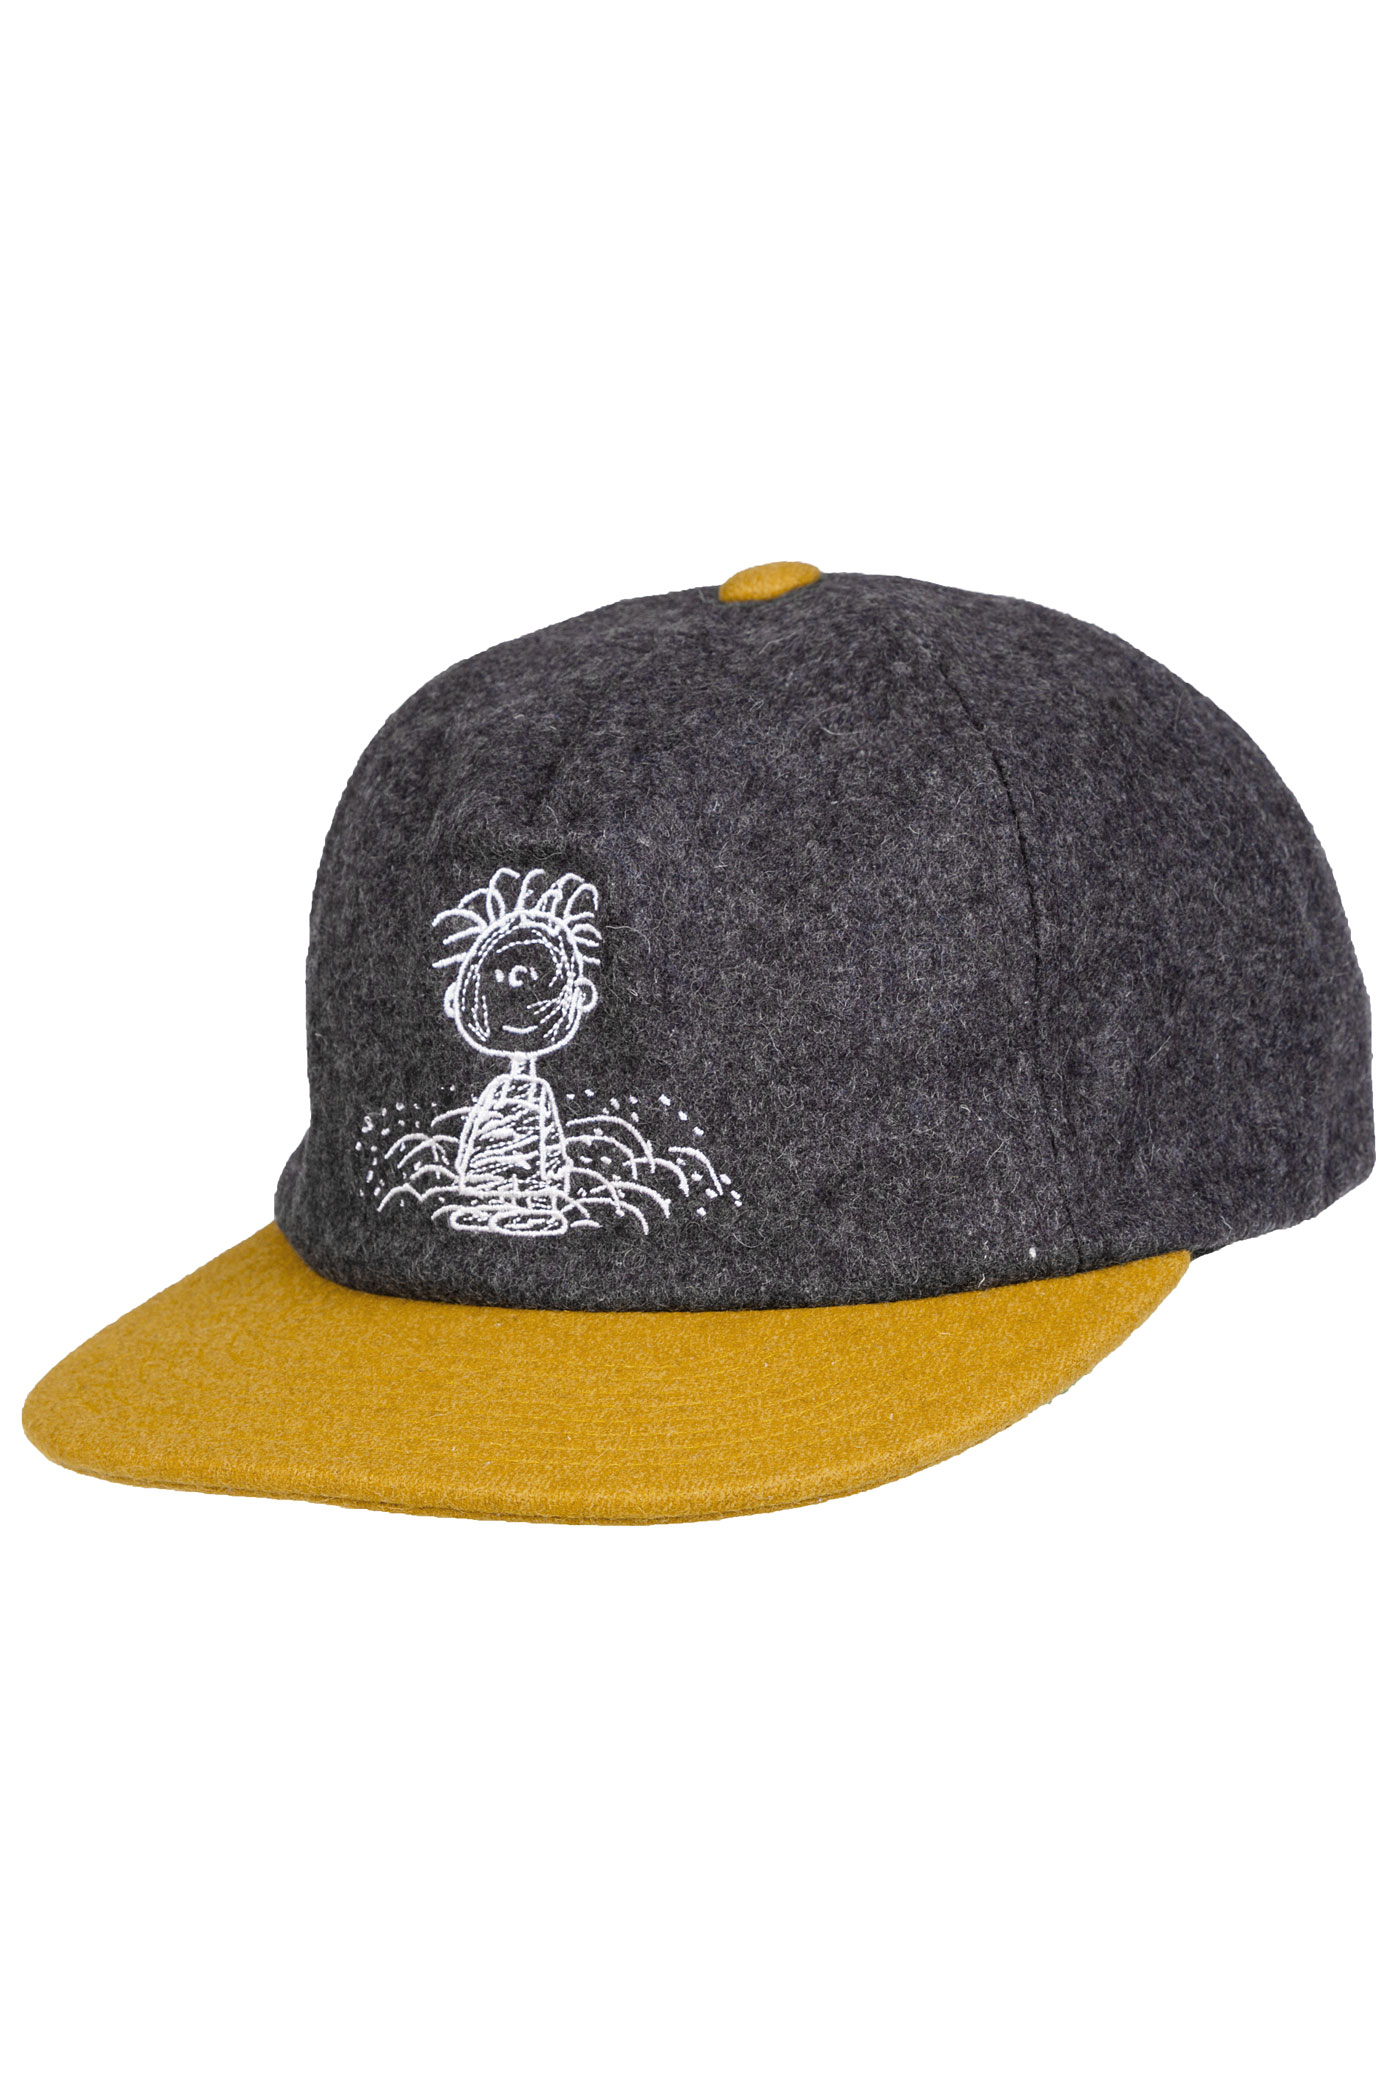 HUF x Peanuts Pigpen Snapback Cap (charcoal yellow) buy at skatedeluxe fe3947a7a8b5